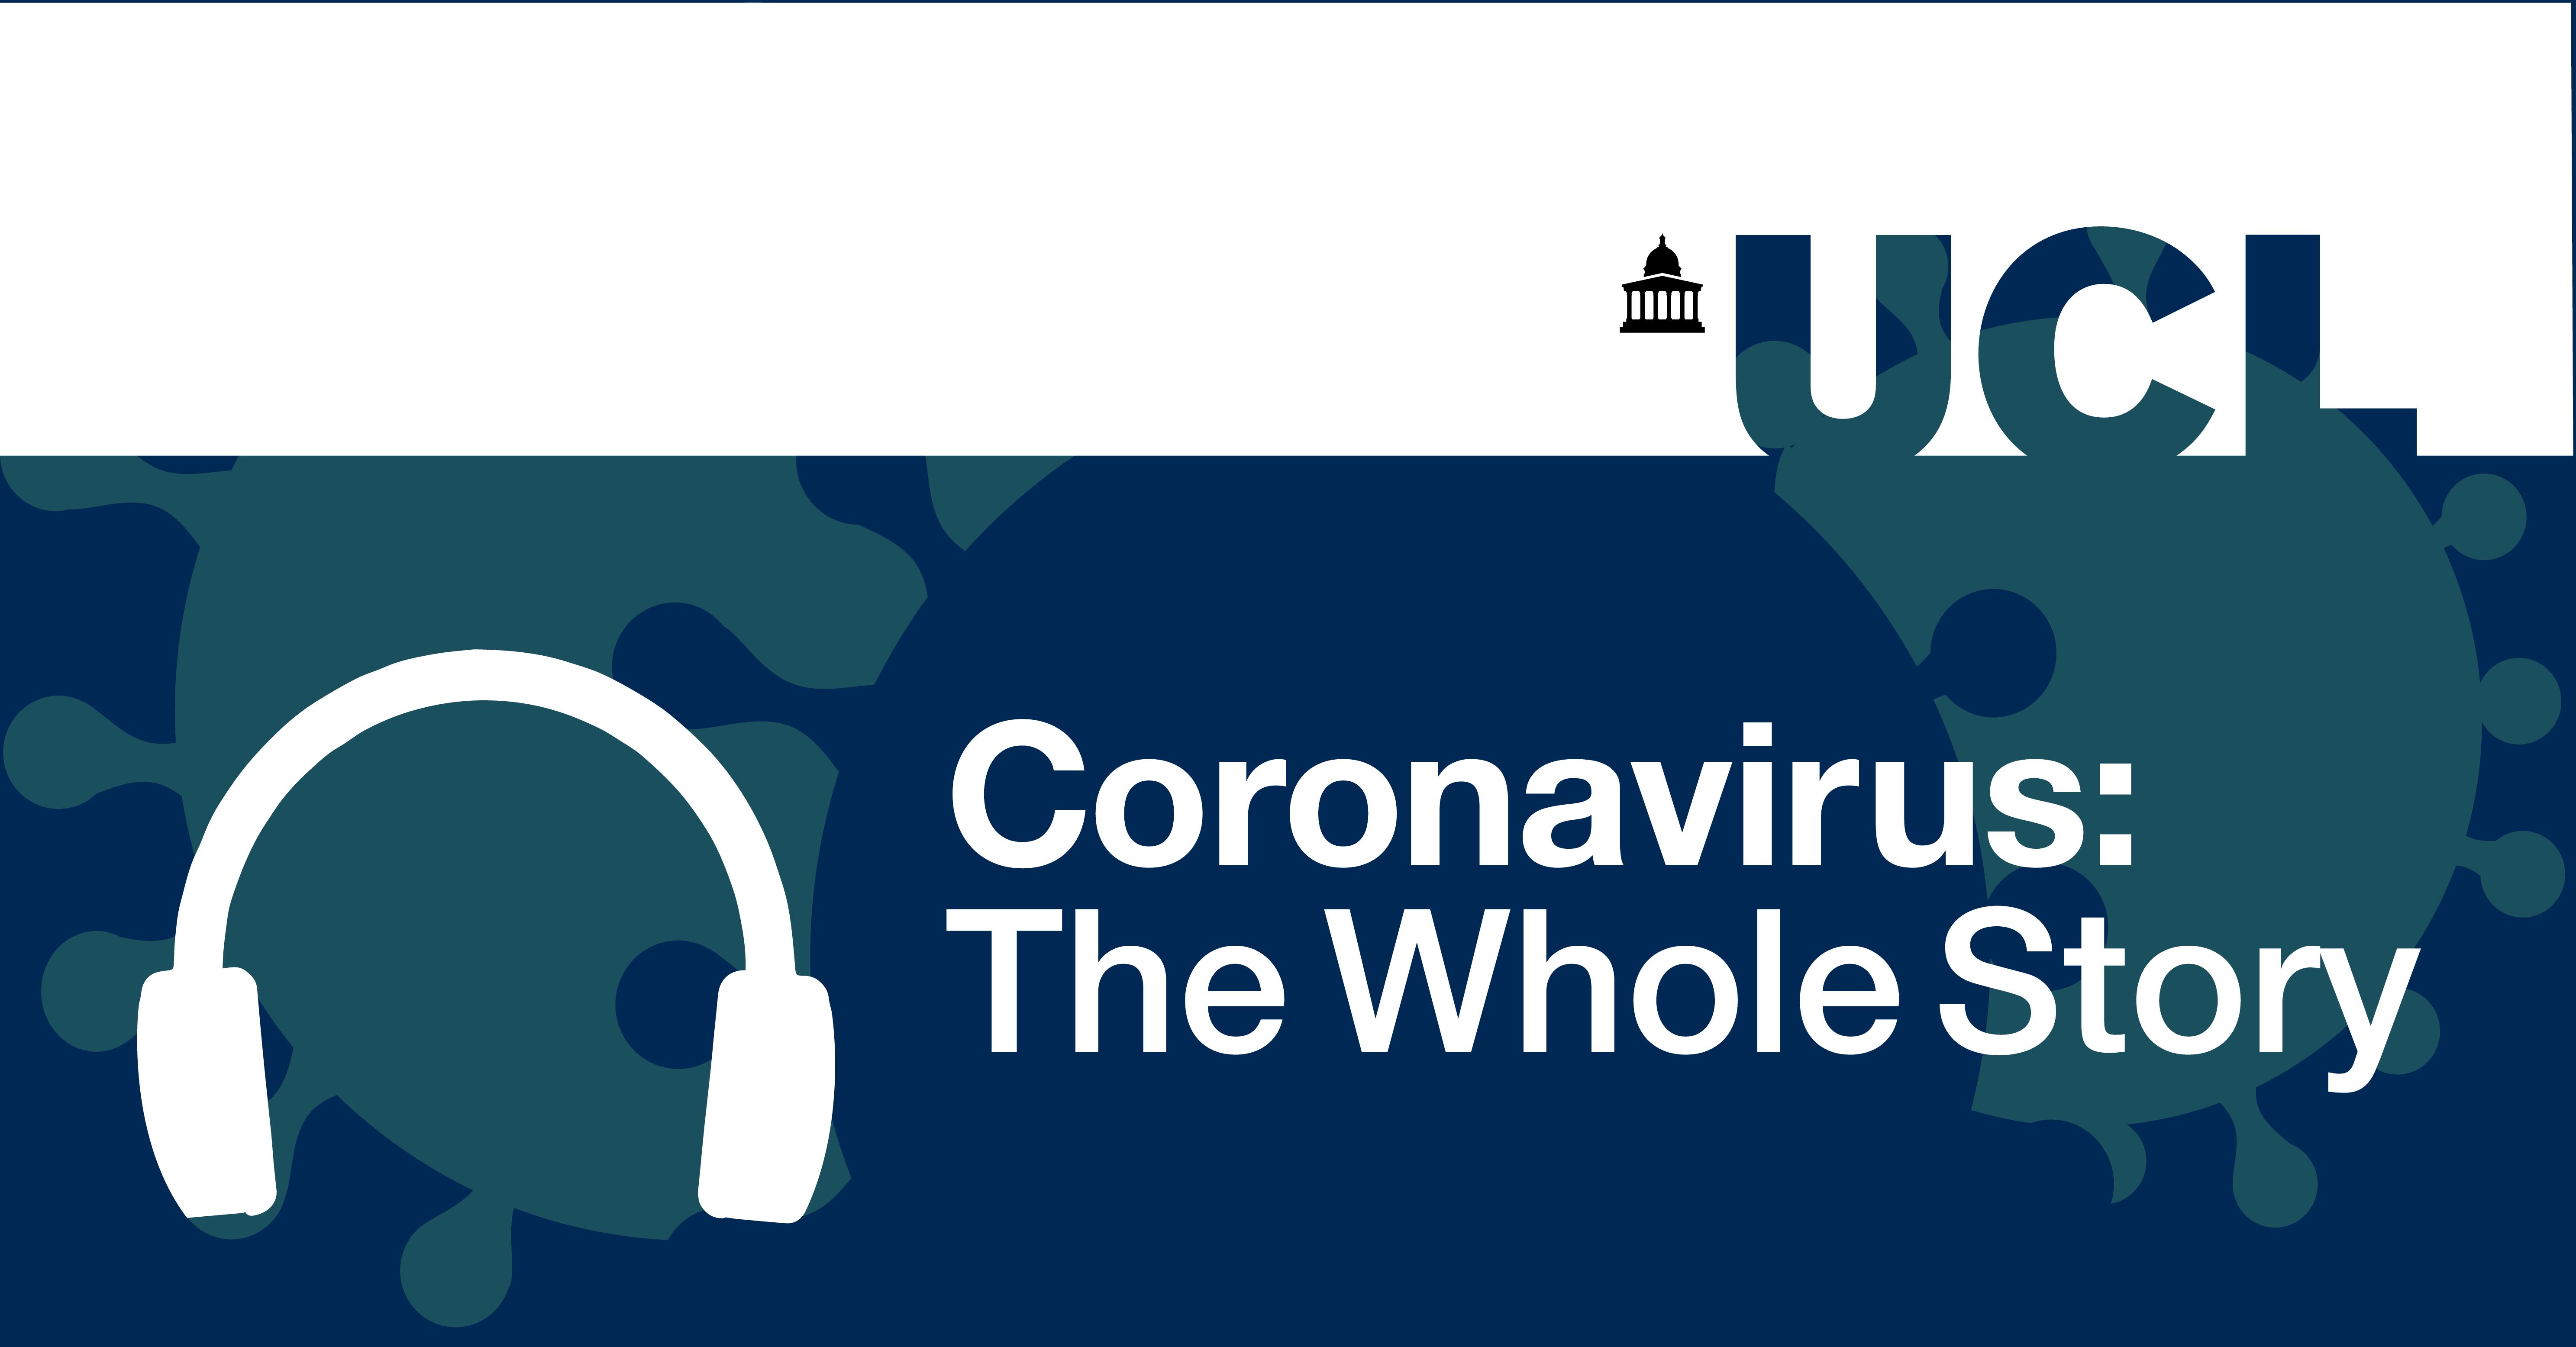 Coronavirus The Whole Story Podcast